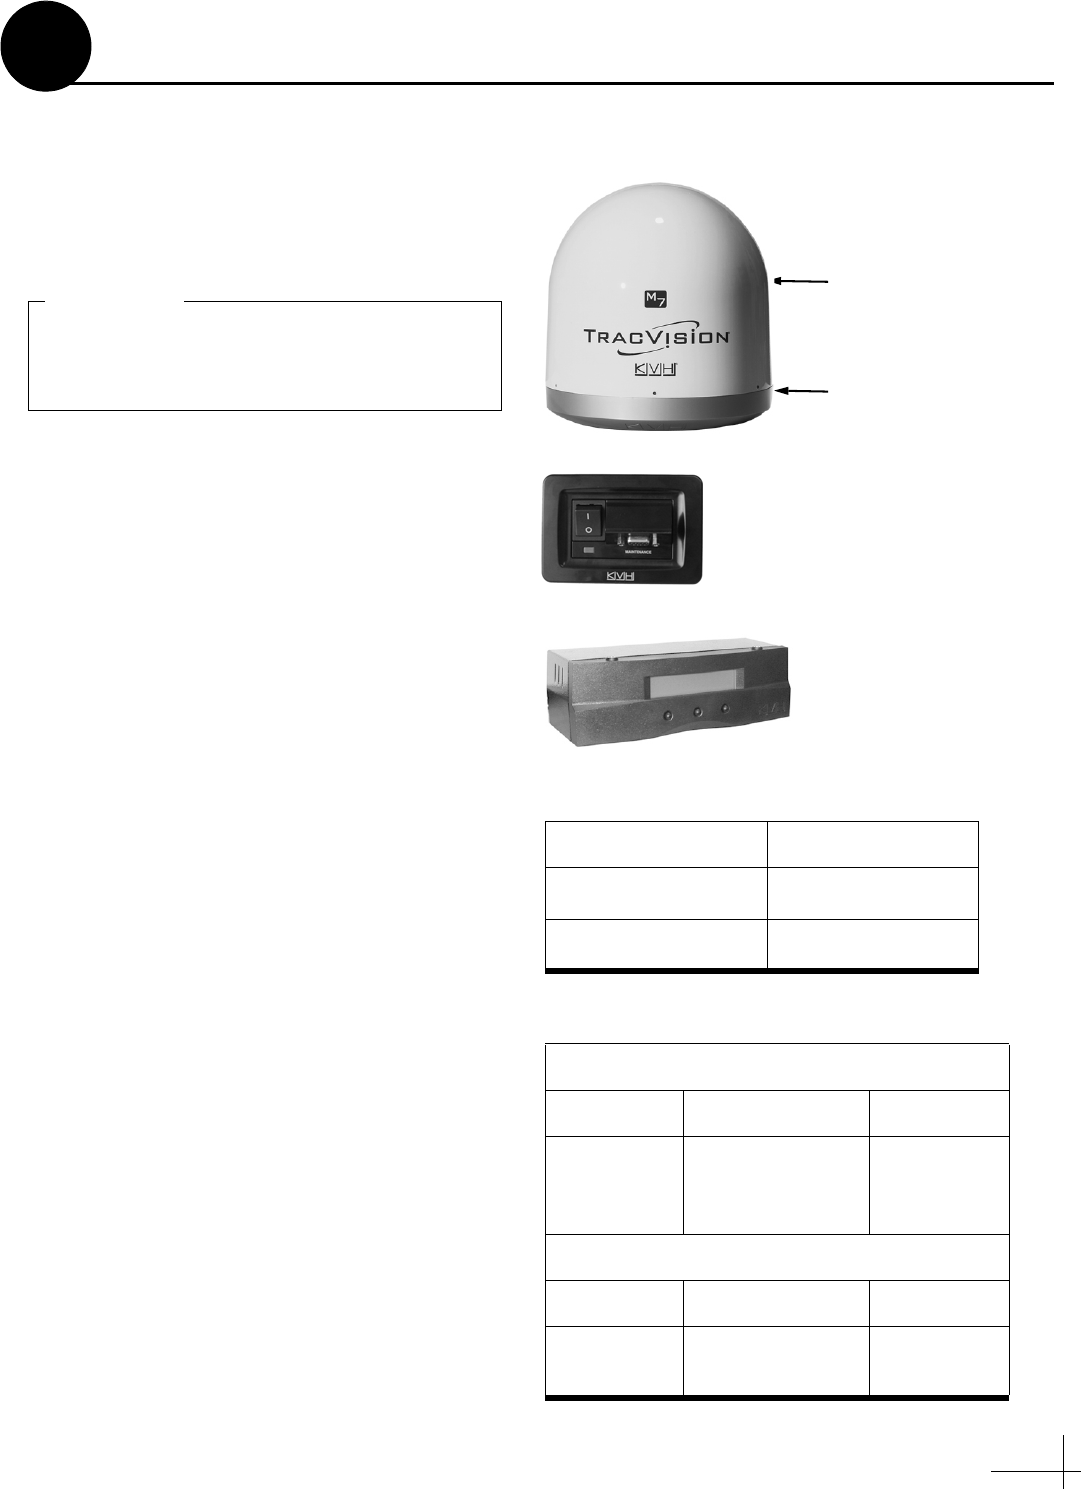 Handleiding Kvh Tracvision M7 Pagina 31 Van 38 English Rj22 Wiring Diagram 3